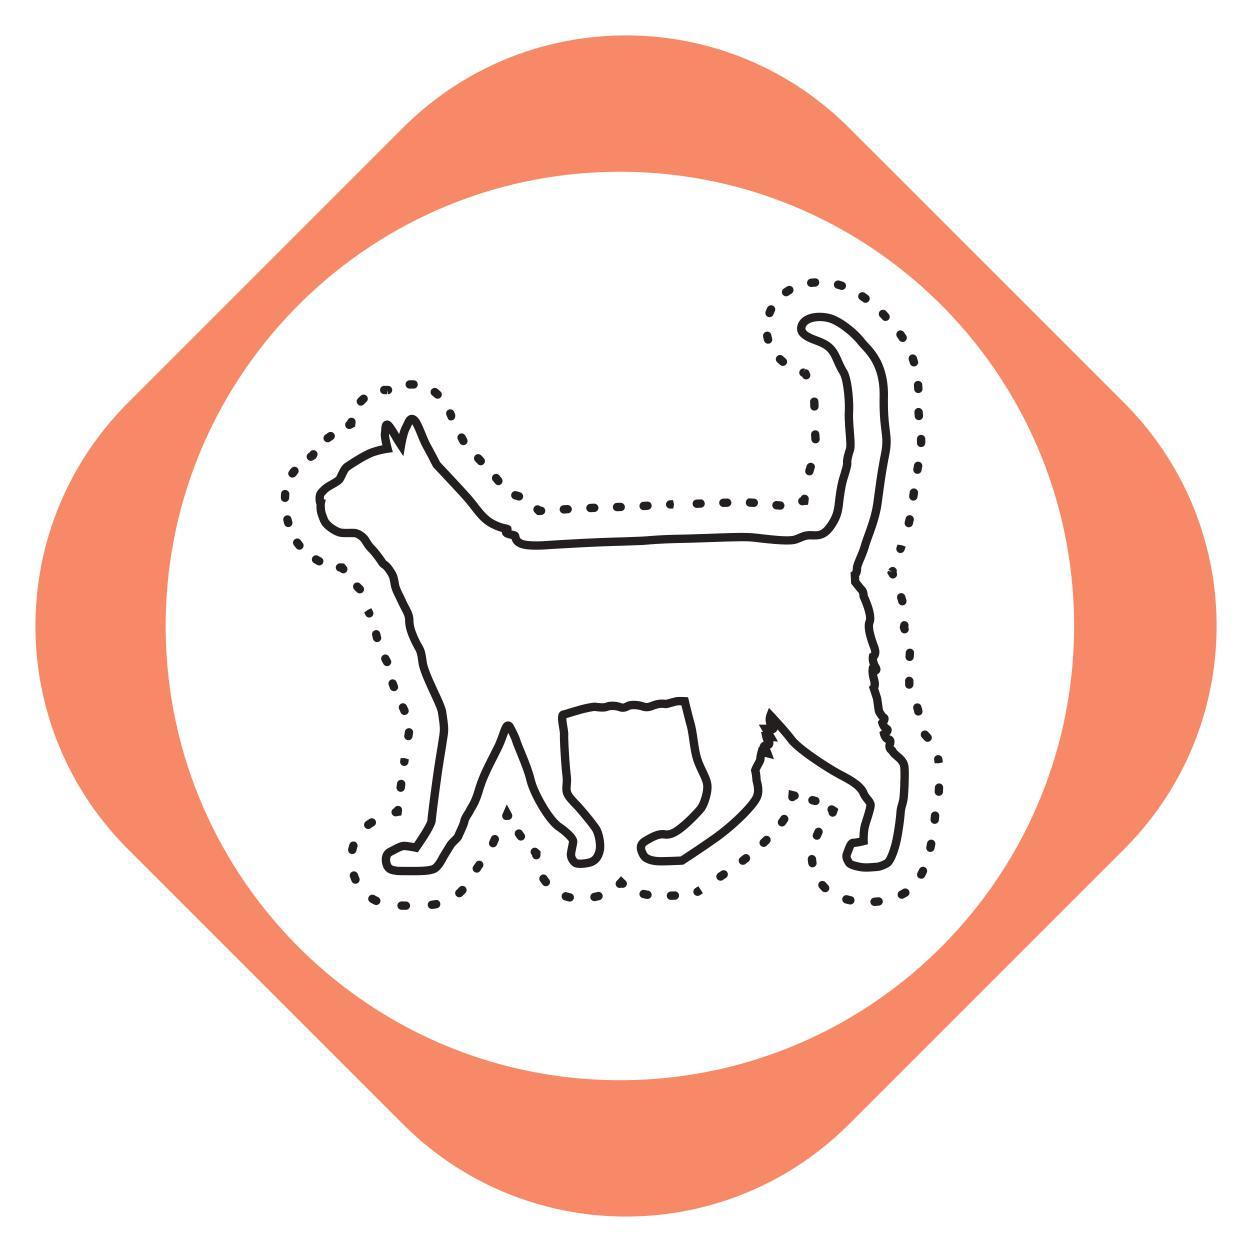 https://pets.alfa-vet.com/image/catalog/avatars/0049.jpg